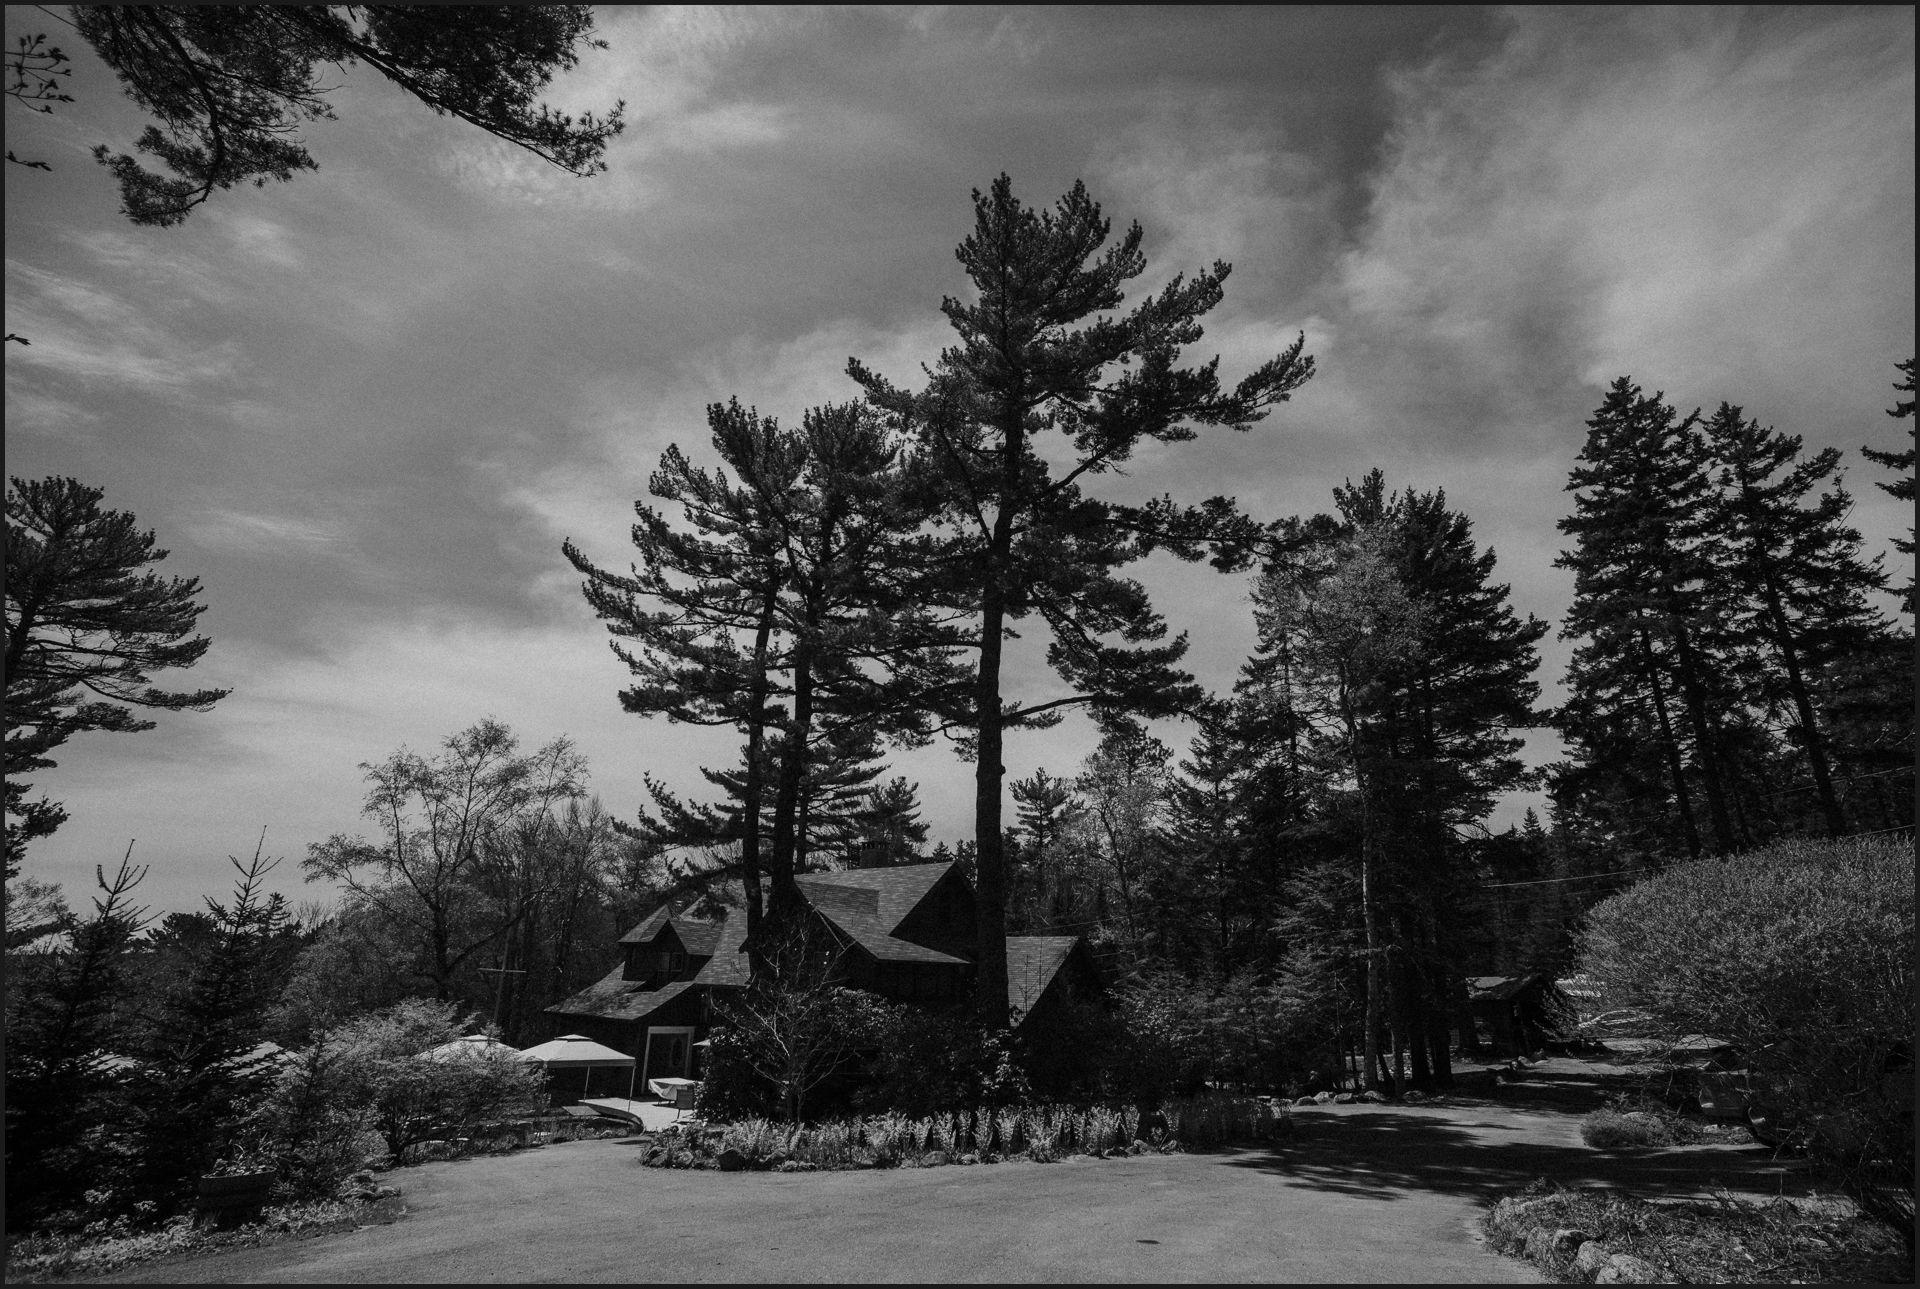 Southwest harbor, maine, black and white, cottage, forest, acadia national park,